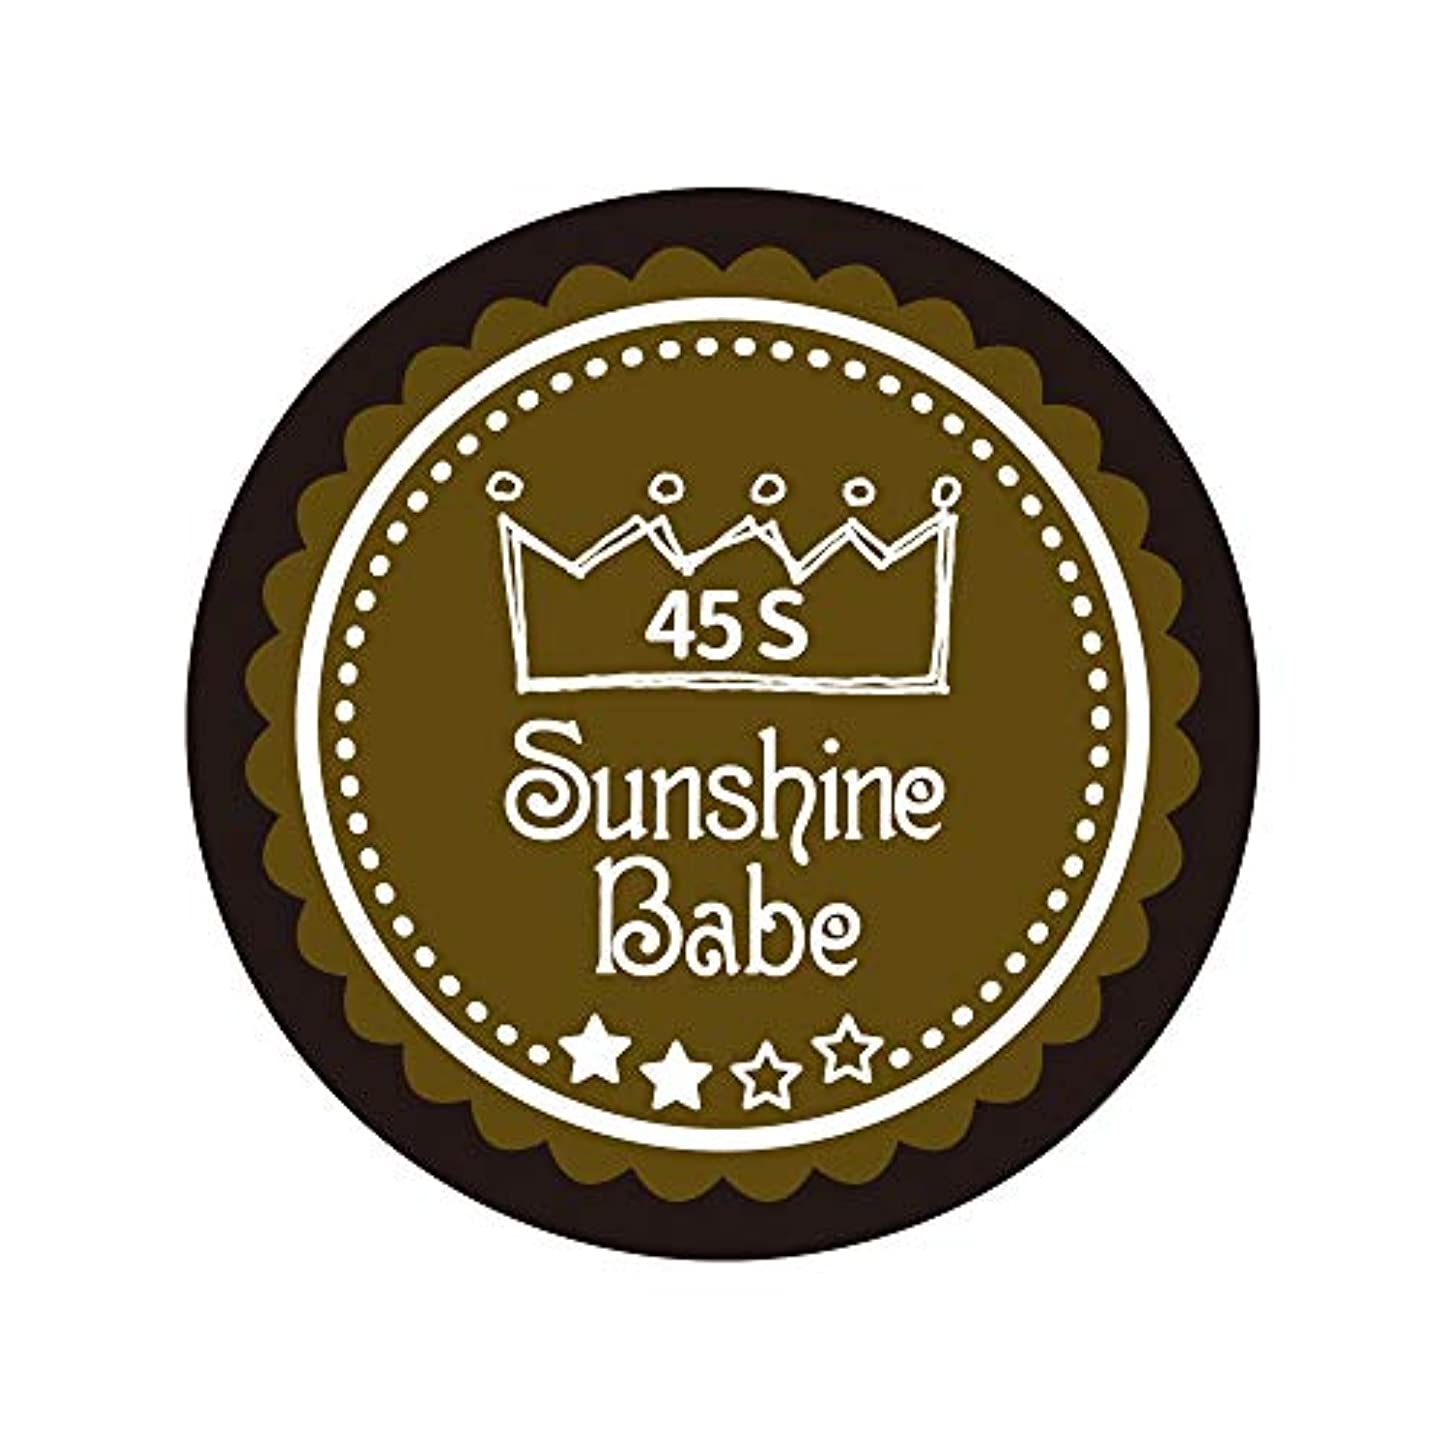 Sunshine Babe カラージェル 45S マティーニオリーブ 2.7g UV/LED対応